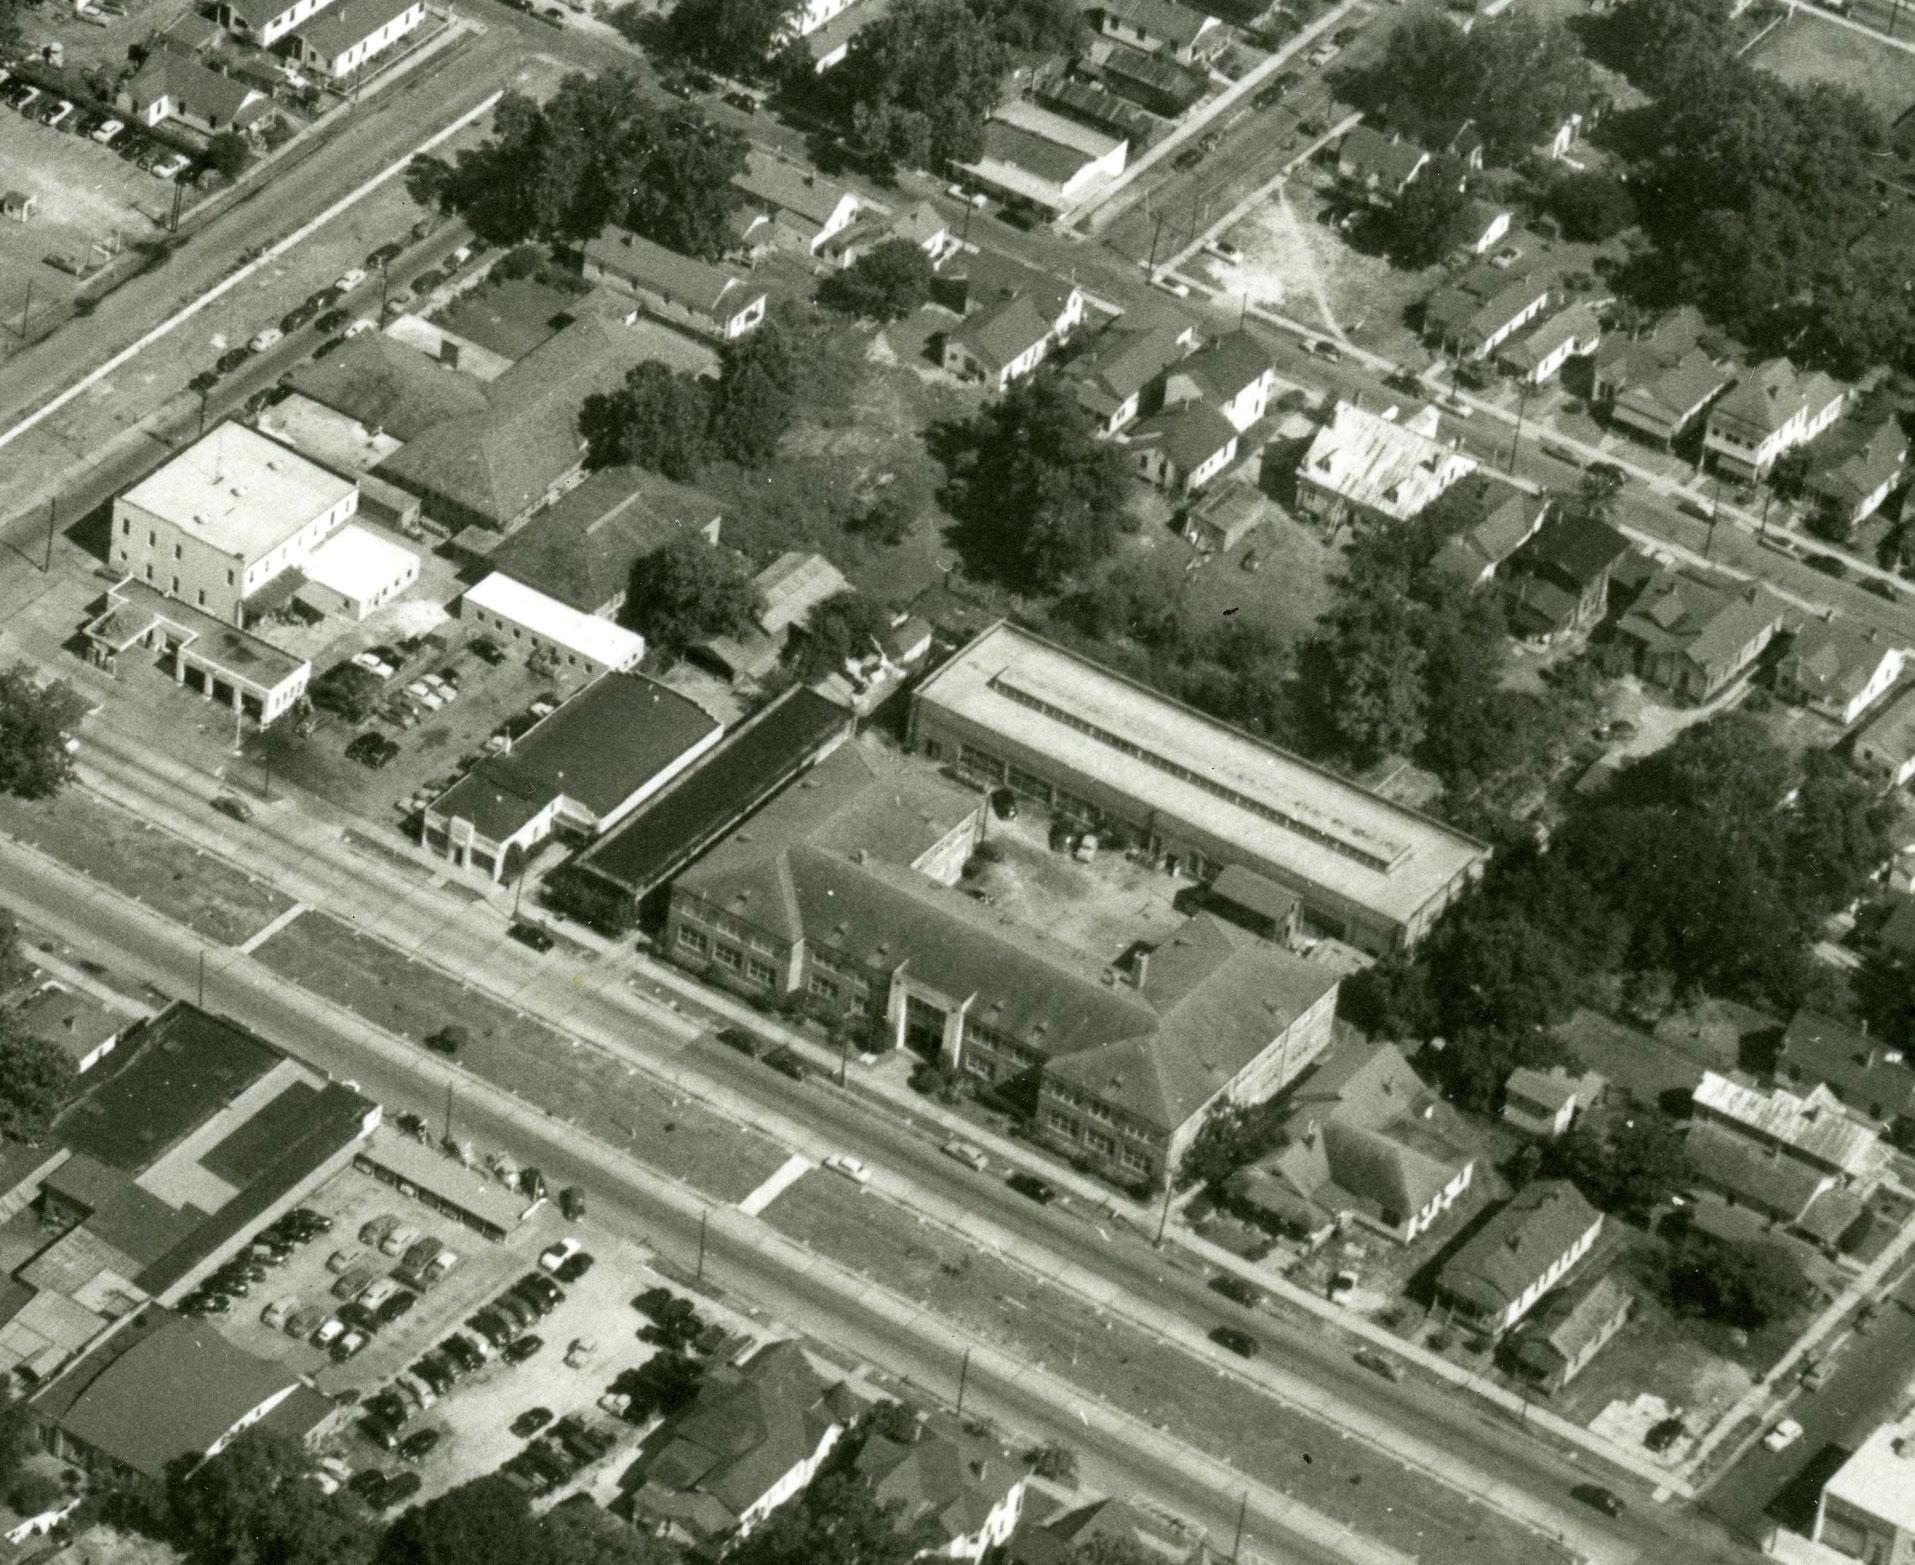 VocationalSchoolAerial1953.jpg